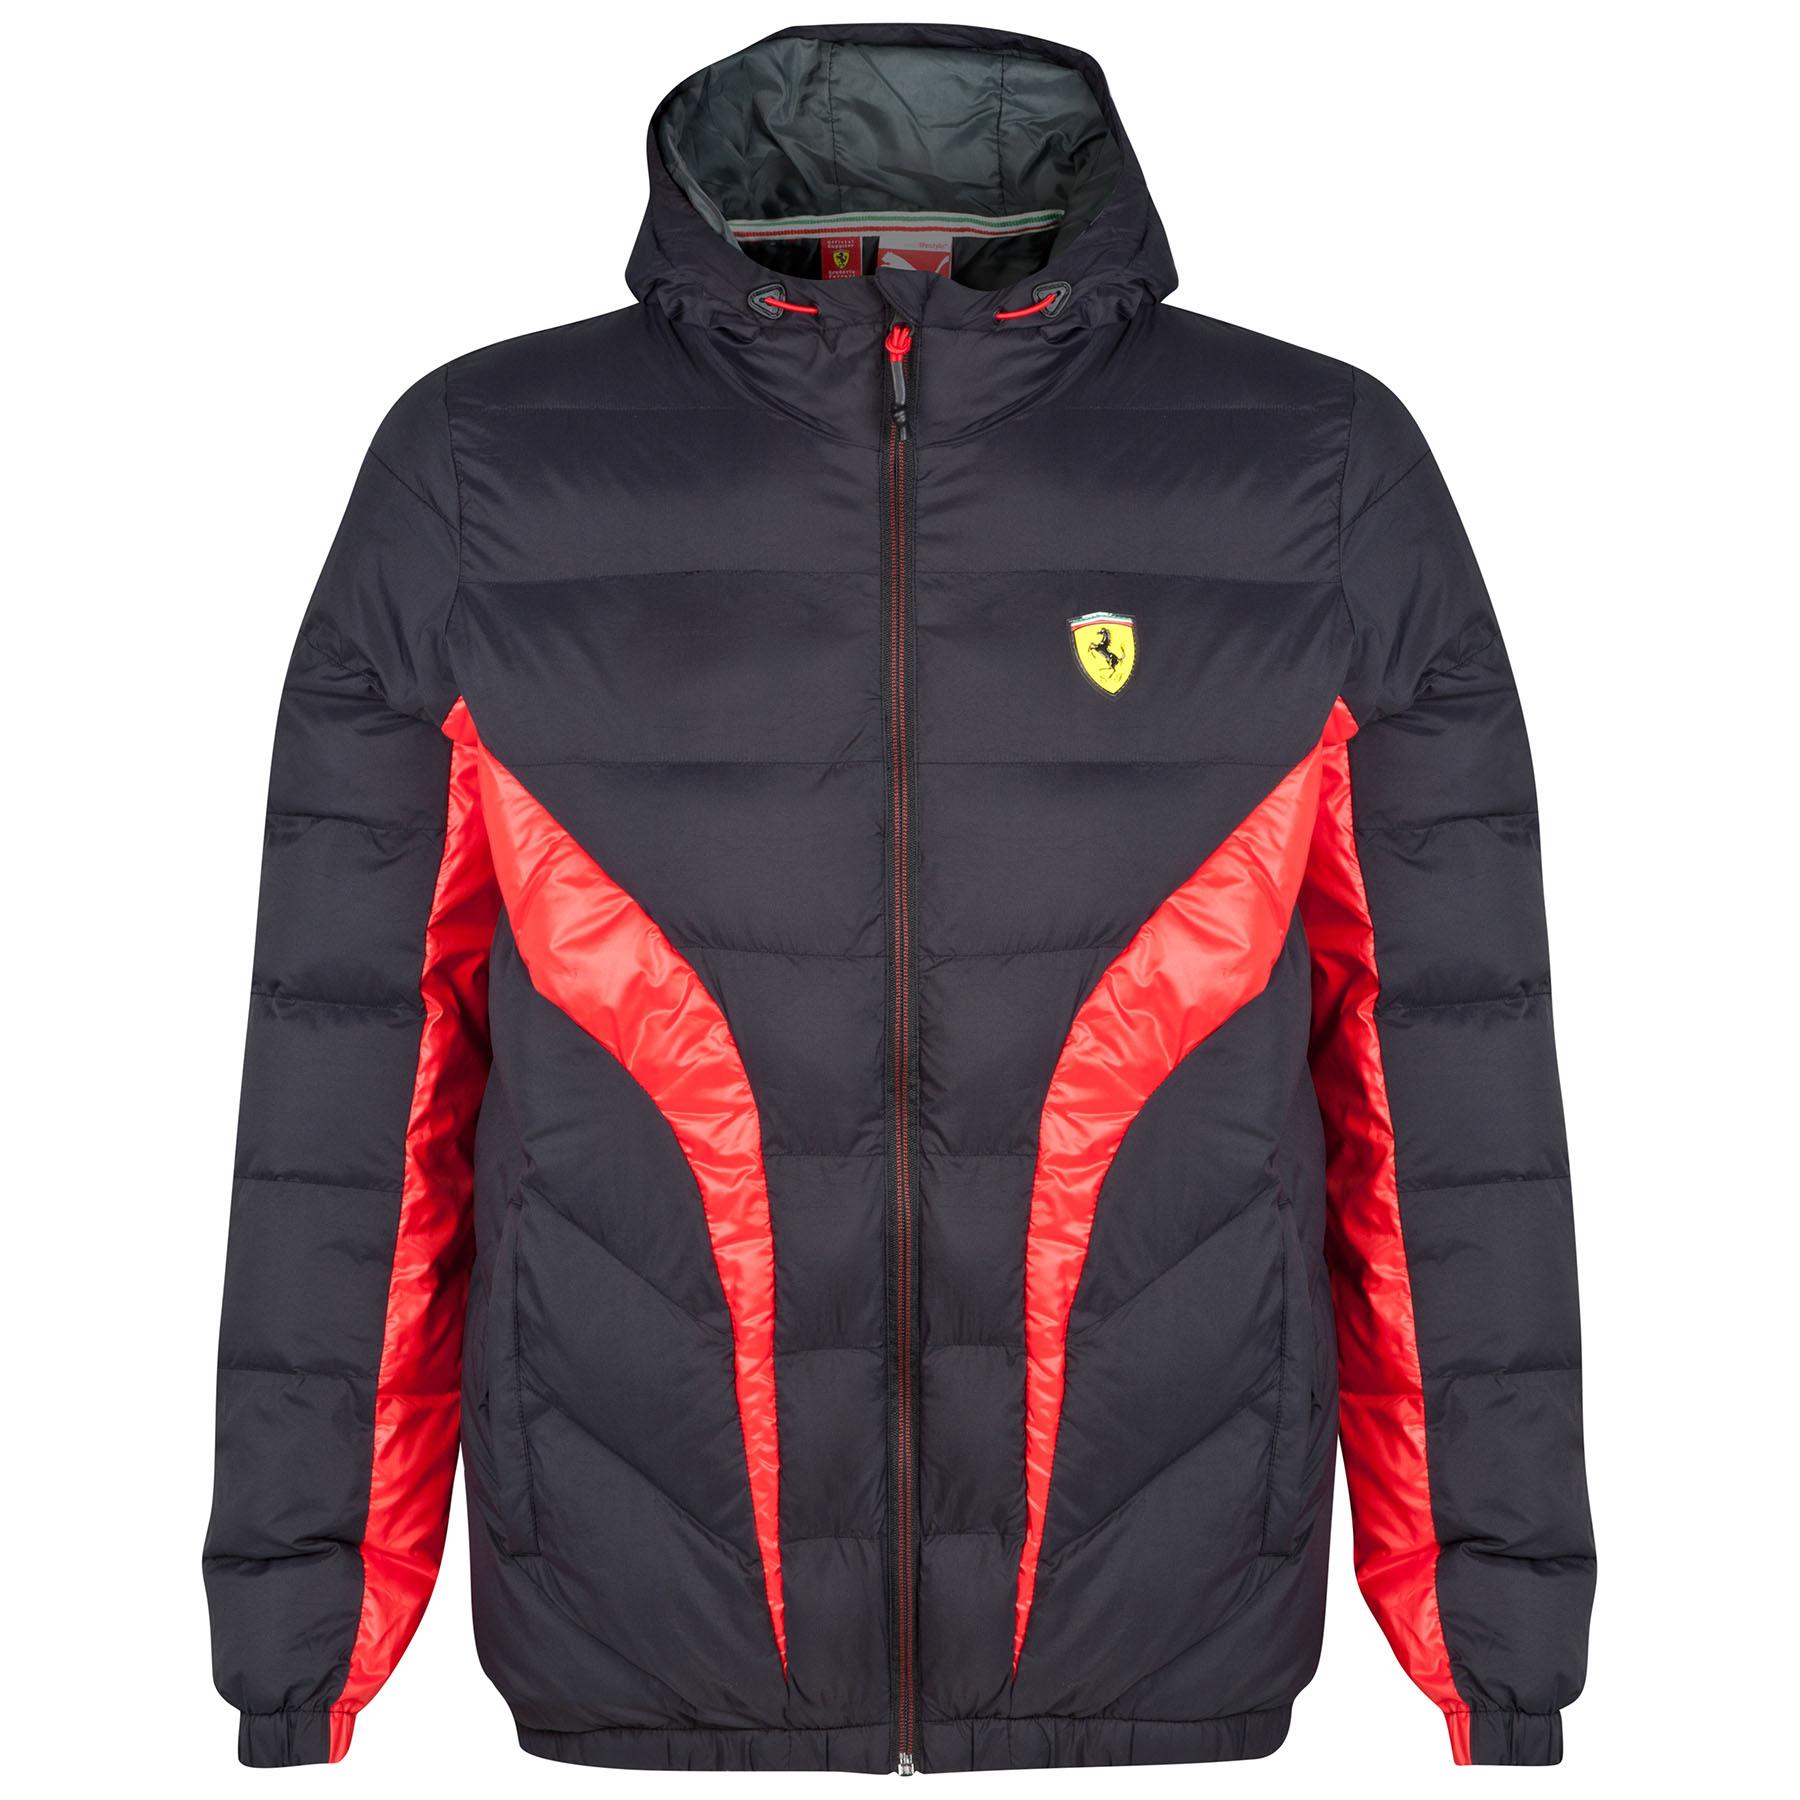 Scuderia Ferrari Padded Jacket - Black